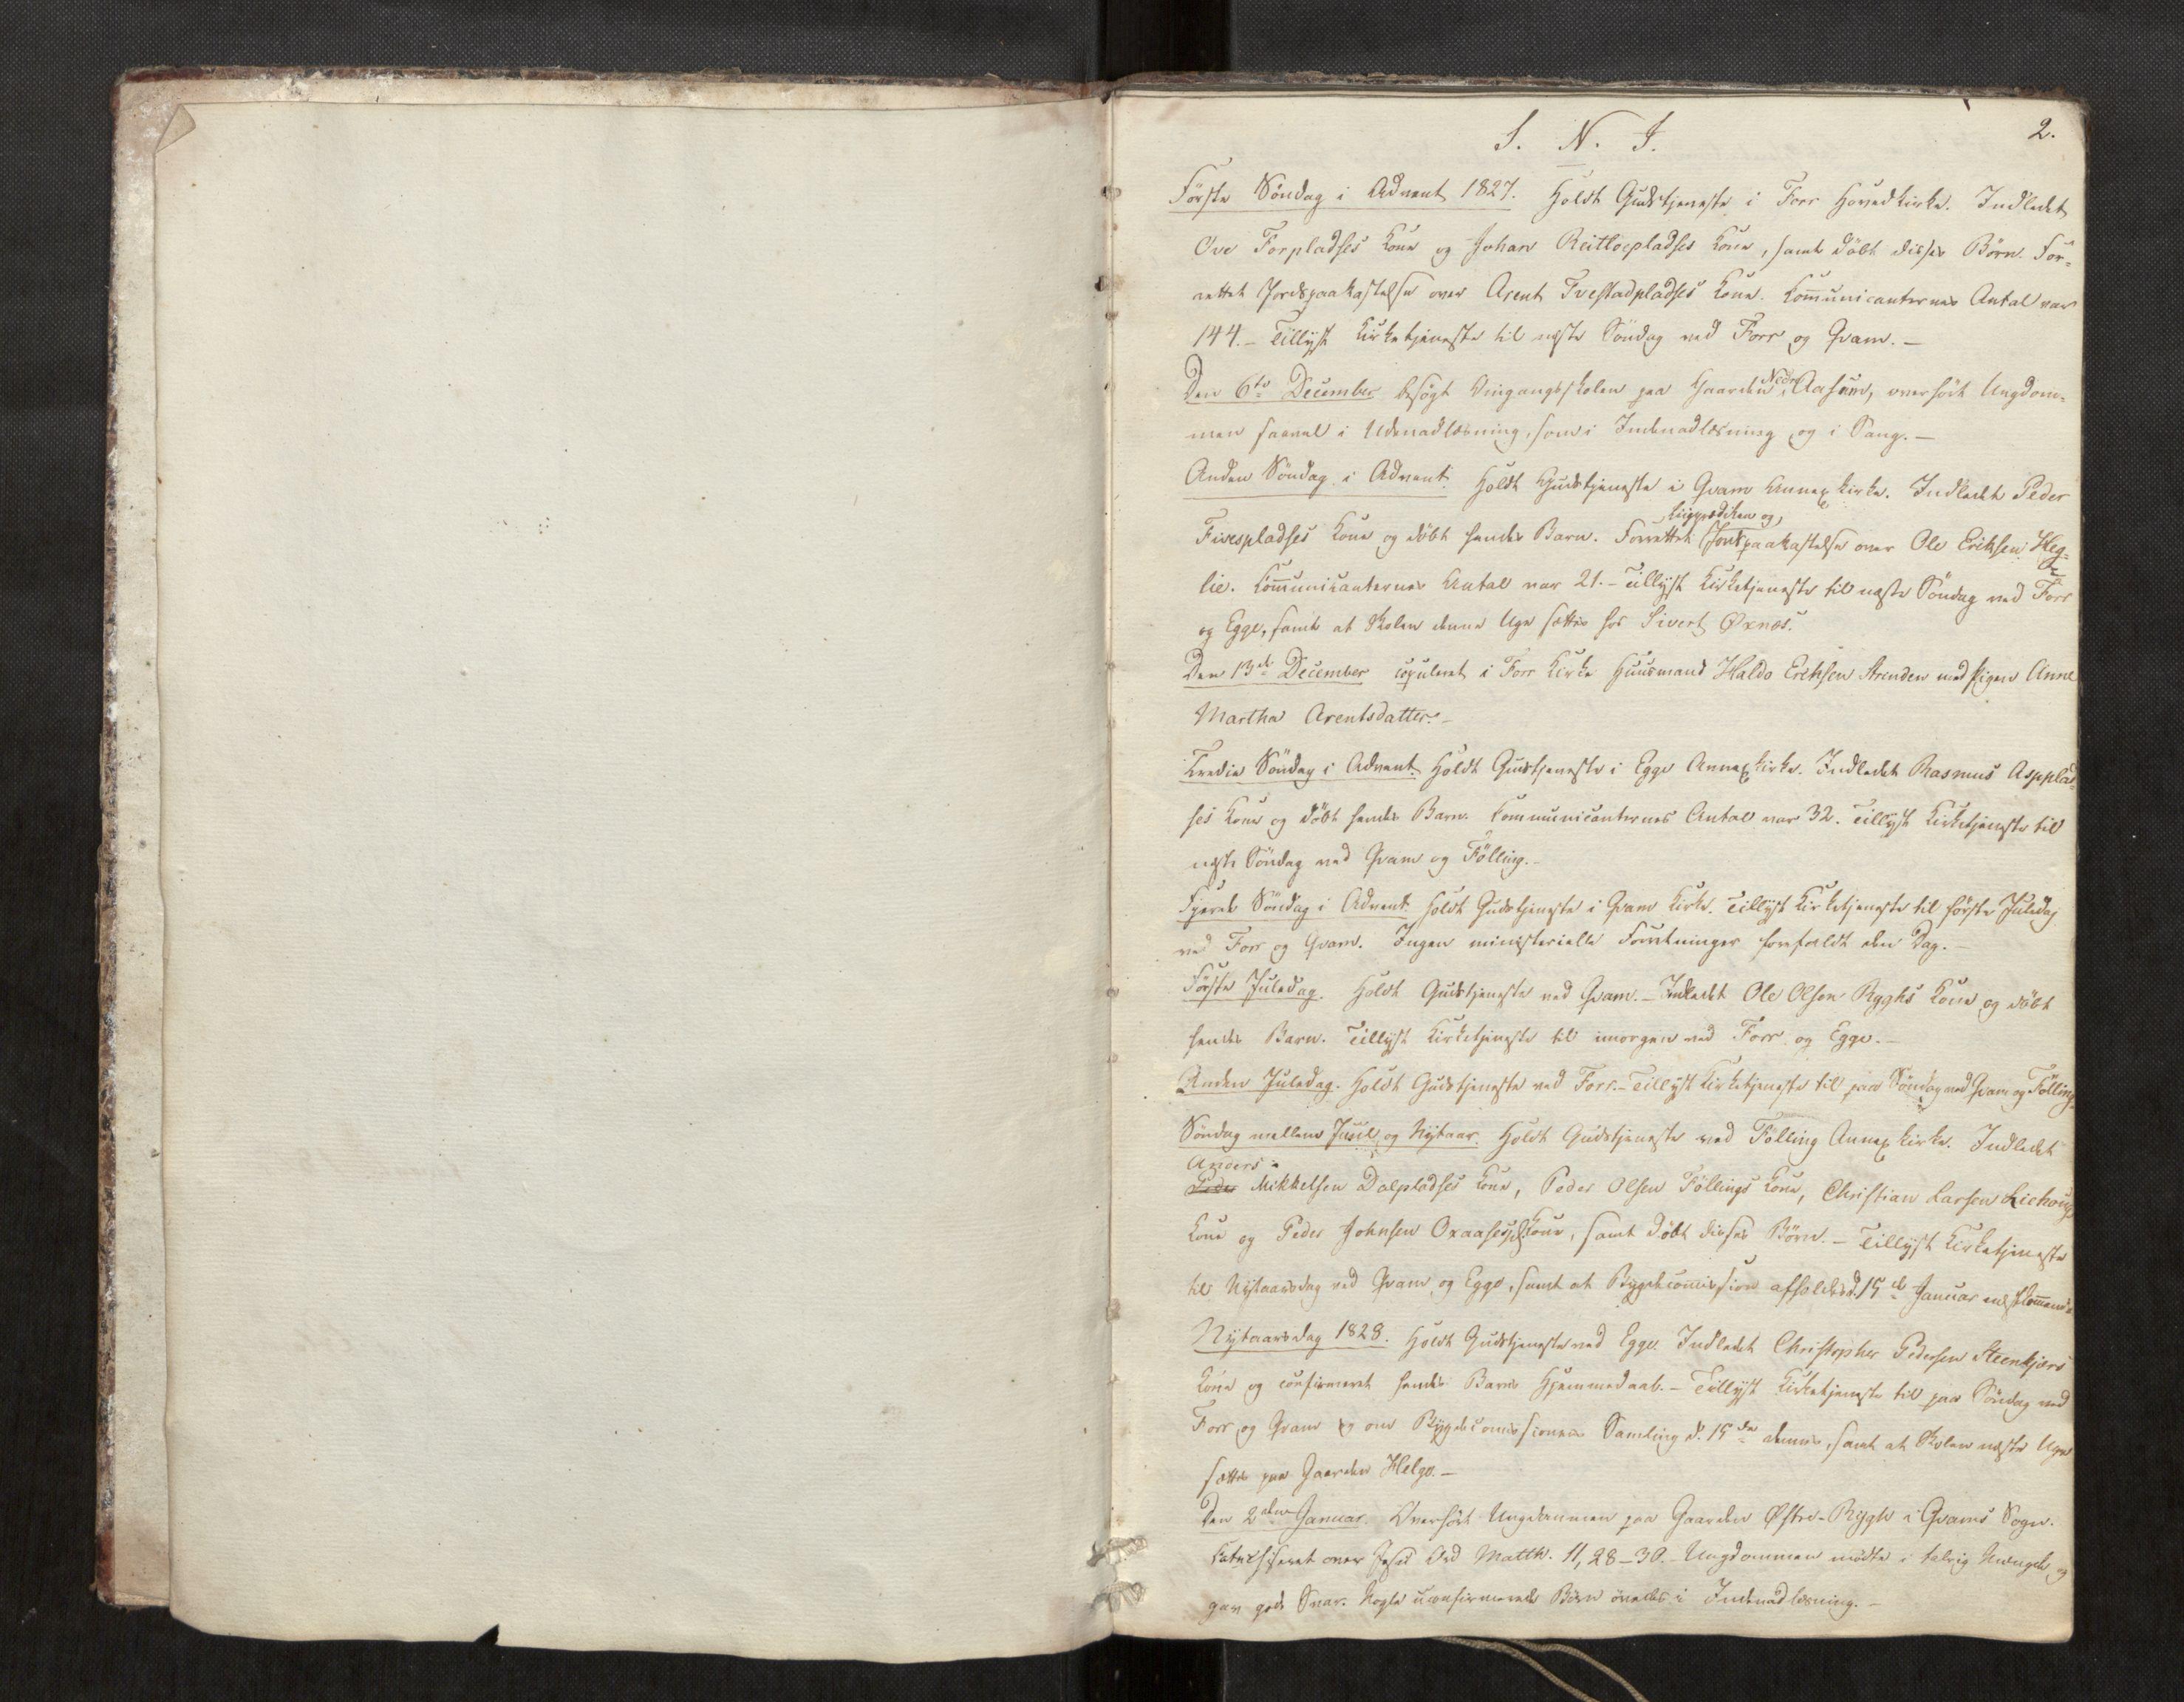 SAT, Stod sokneprestkontor, I/I1/I1d/L0001: Curate's parish register no. 1, 1827-1849, p. 2